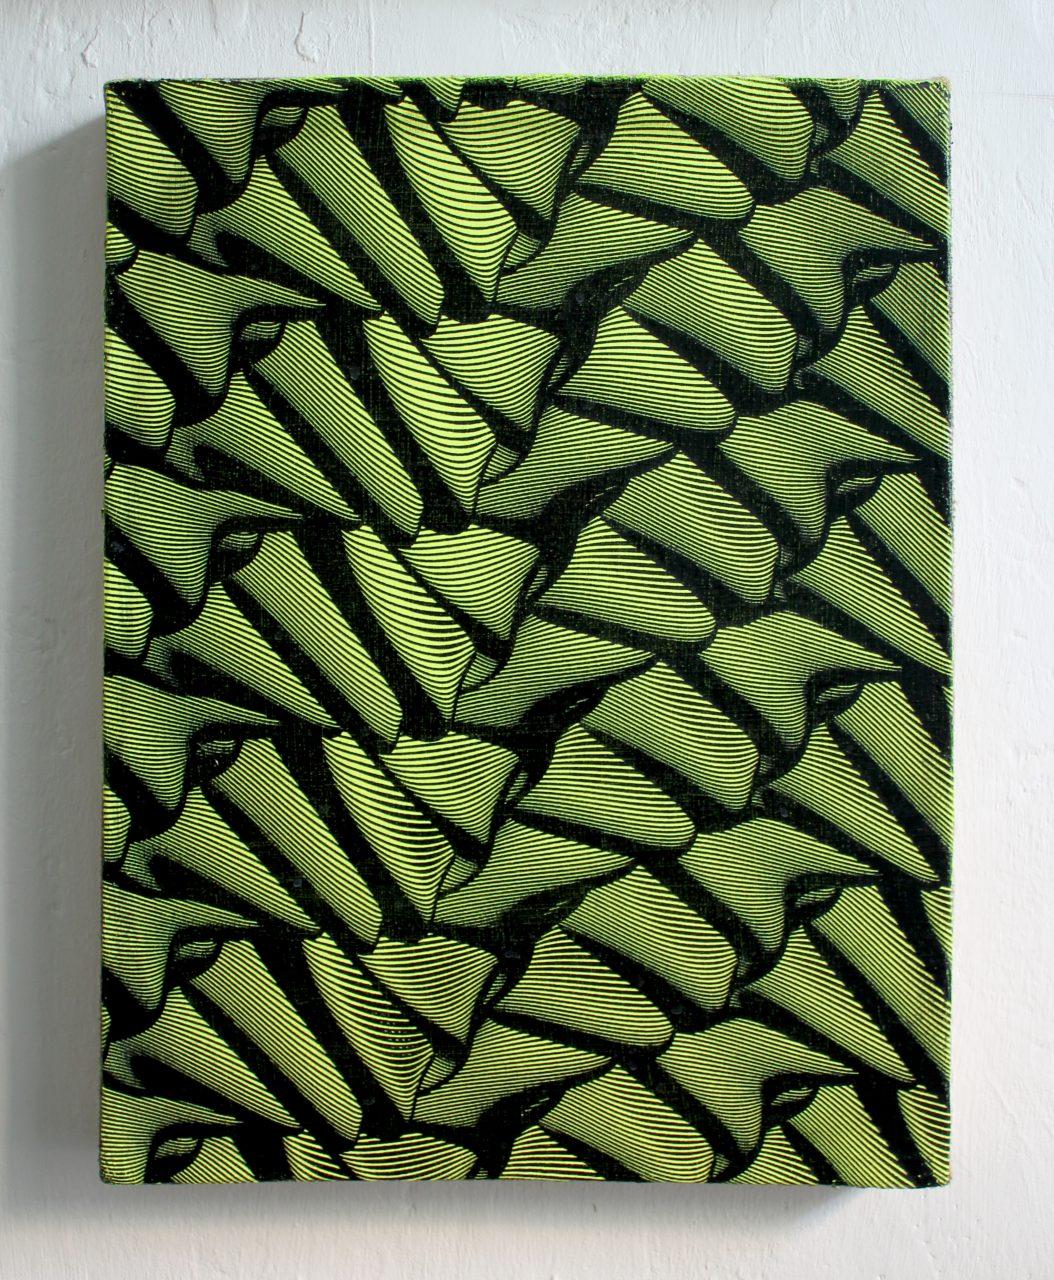 Pangolin (2020) Enamel on burlap 40 x 52 cm